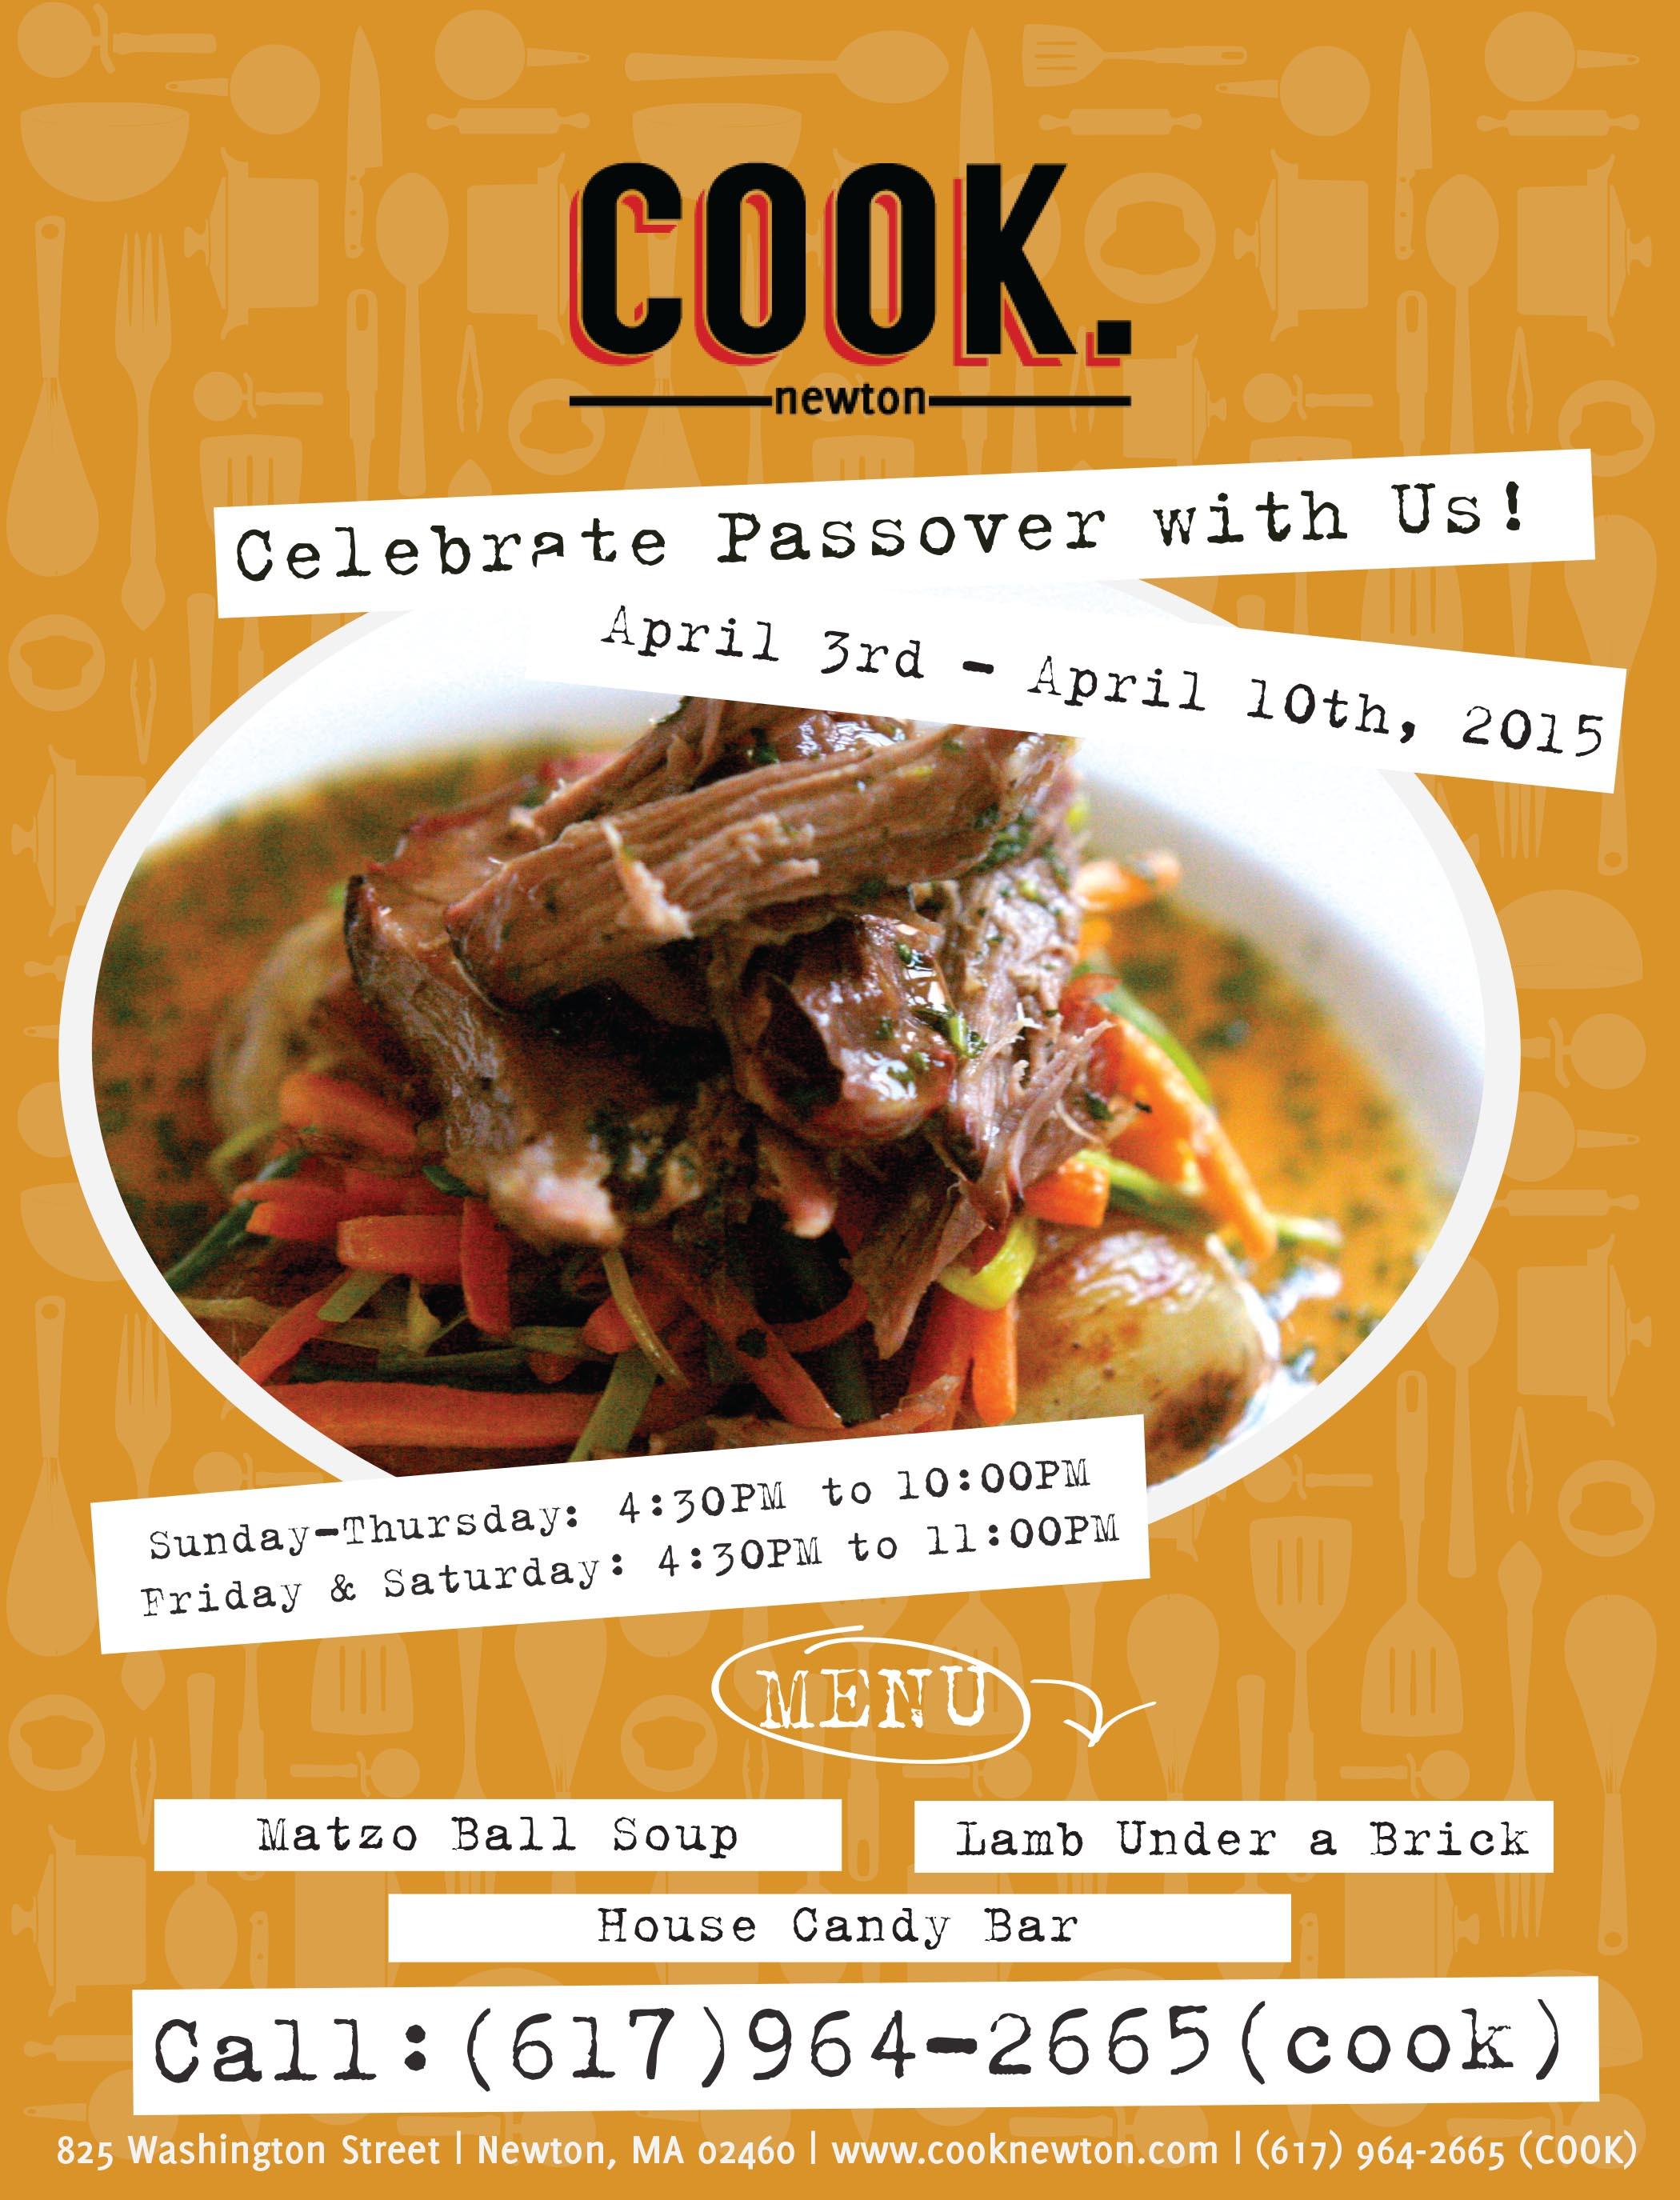 Cook Restaurant Offers Seder Menu in Honor of Passover